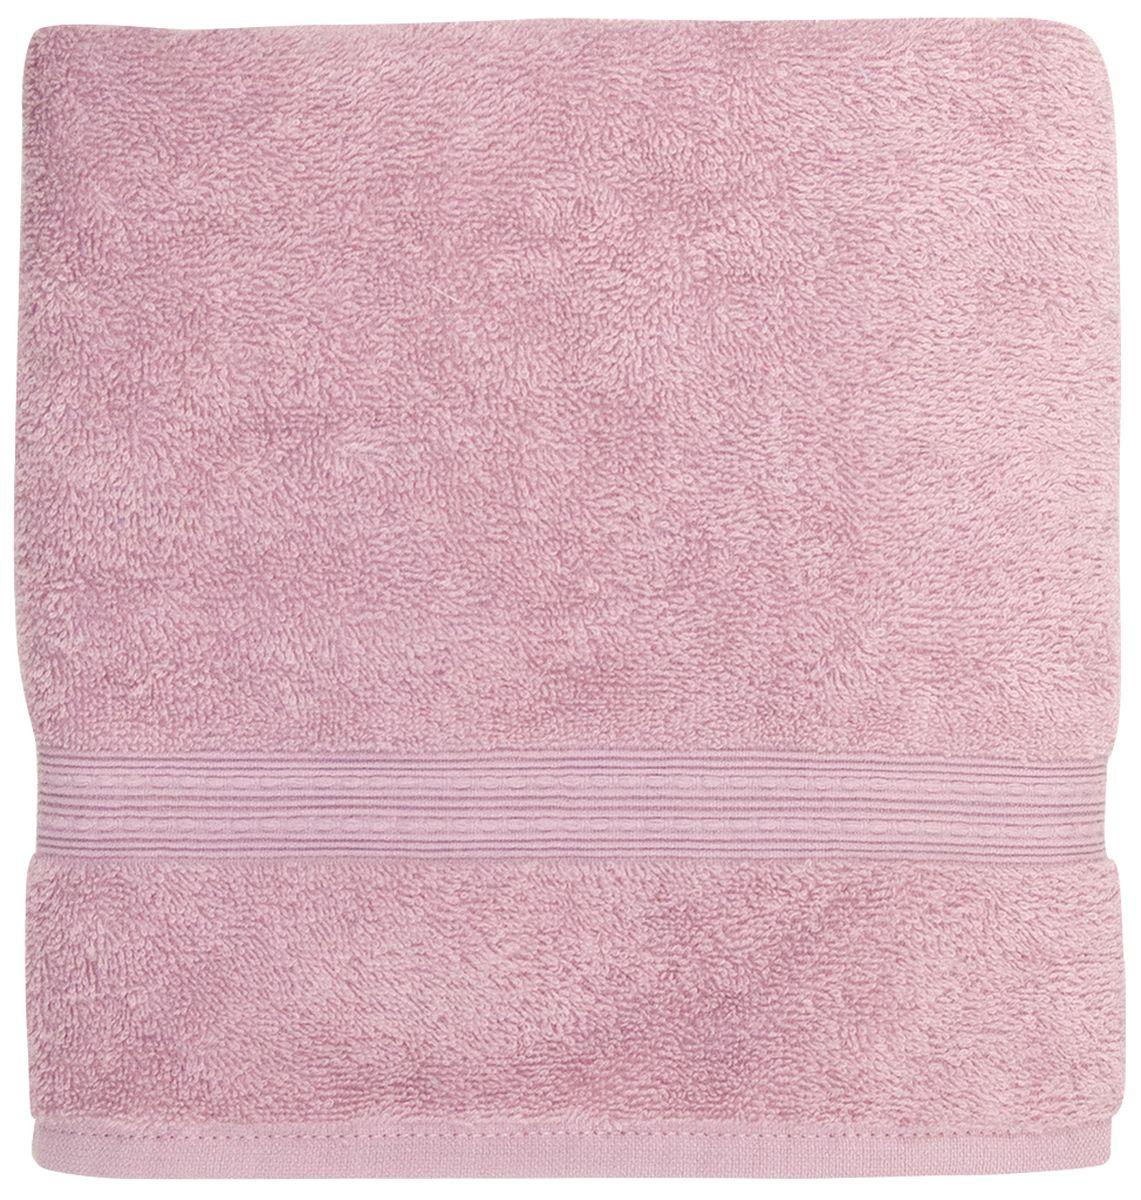 Полотенце банное Bonita Classic, махровое, цвет: лаванда, 70 х 140 см1011217223Полотенце банное 70*140 Bonita Classic, махровое